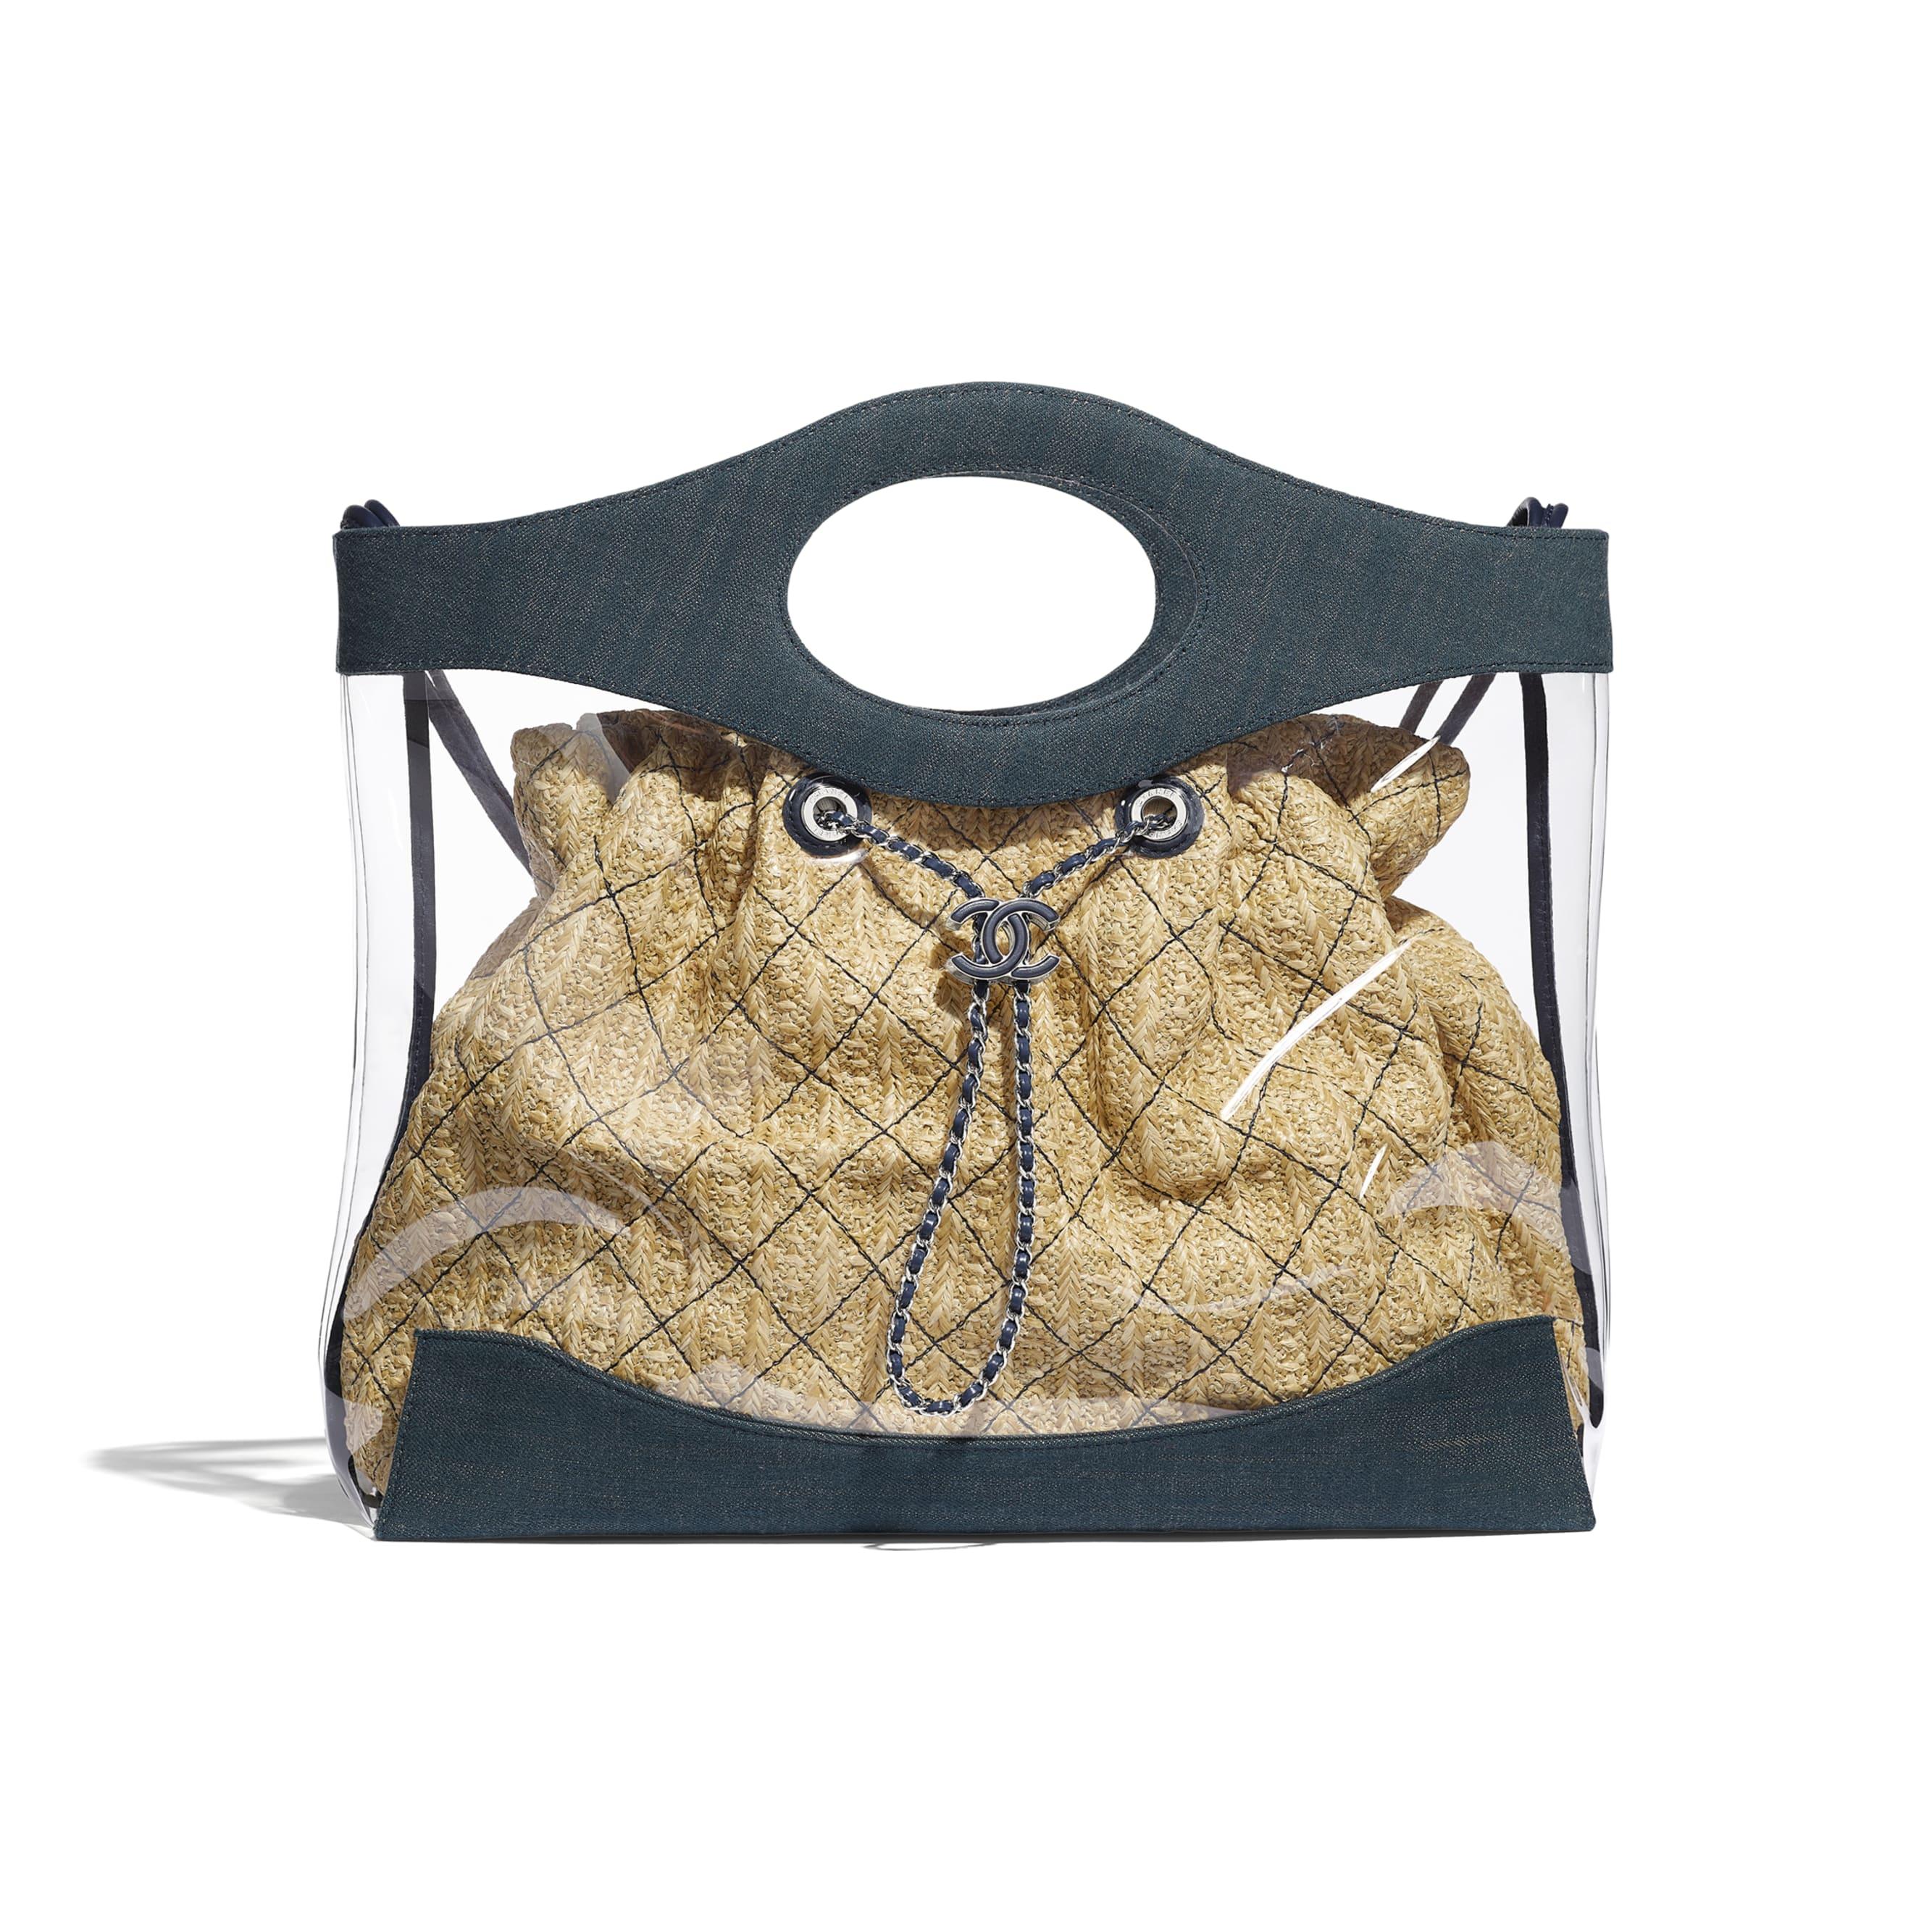 CHANEL 31 Shopping Bag - Blue - PVC, Denim, Calfskin & Silver-Tone Metal - Default view - see standard sized version